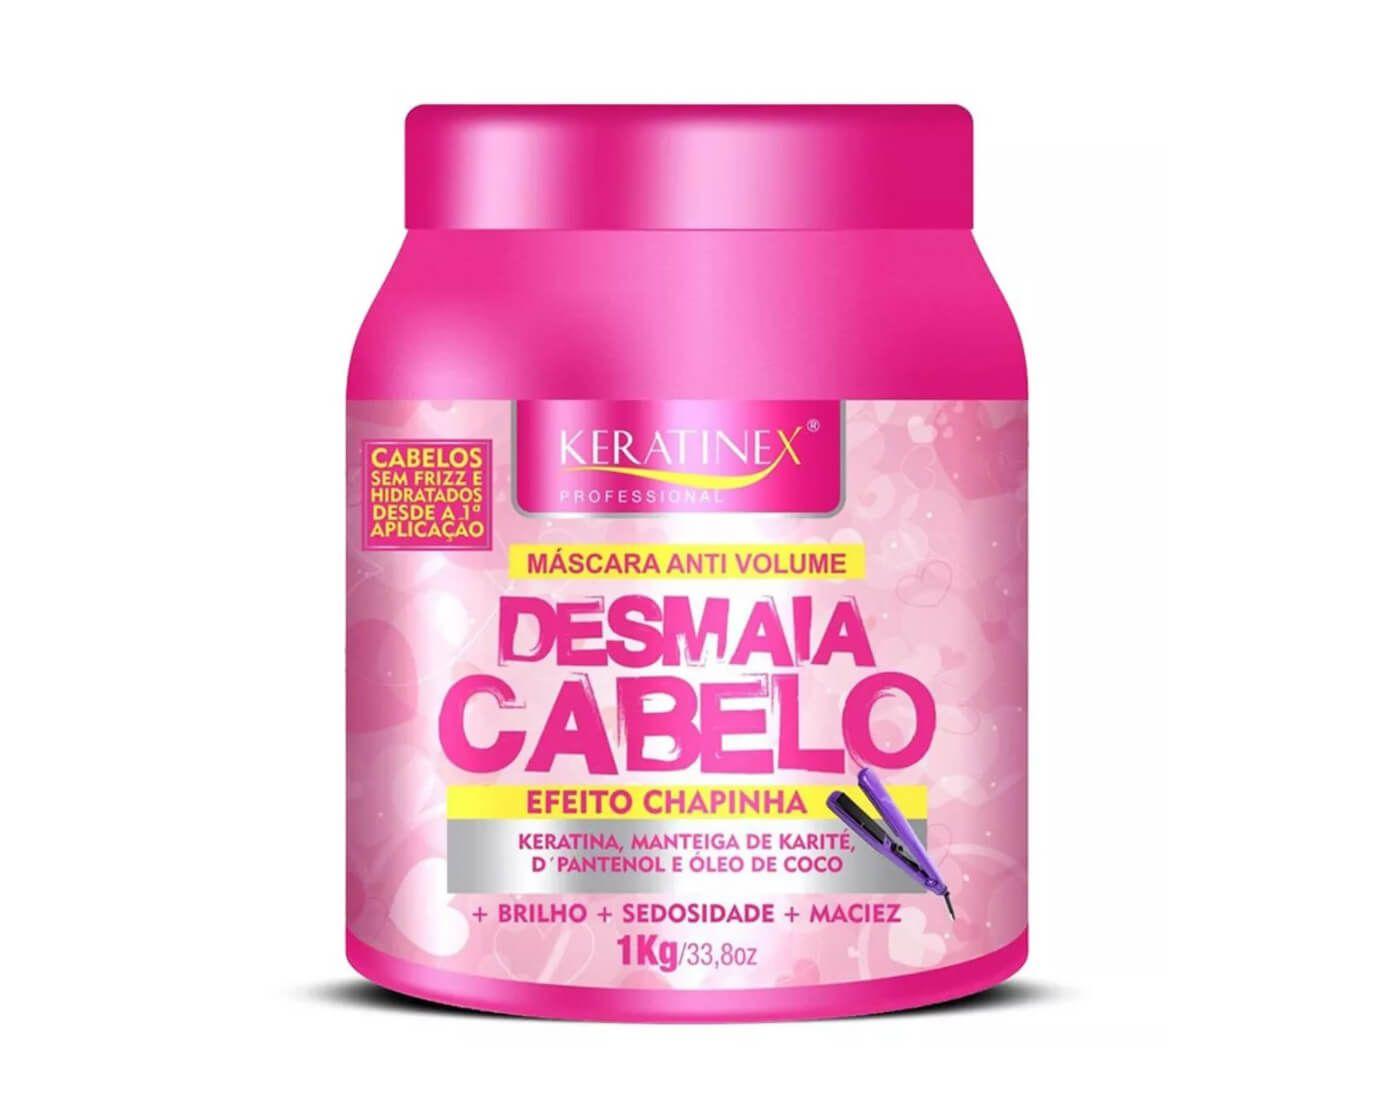 Desmaia Cabelo Ultra Hidratante Keratinex 1kg